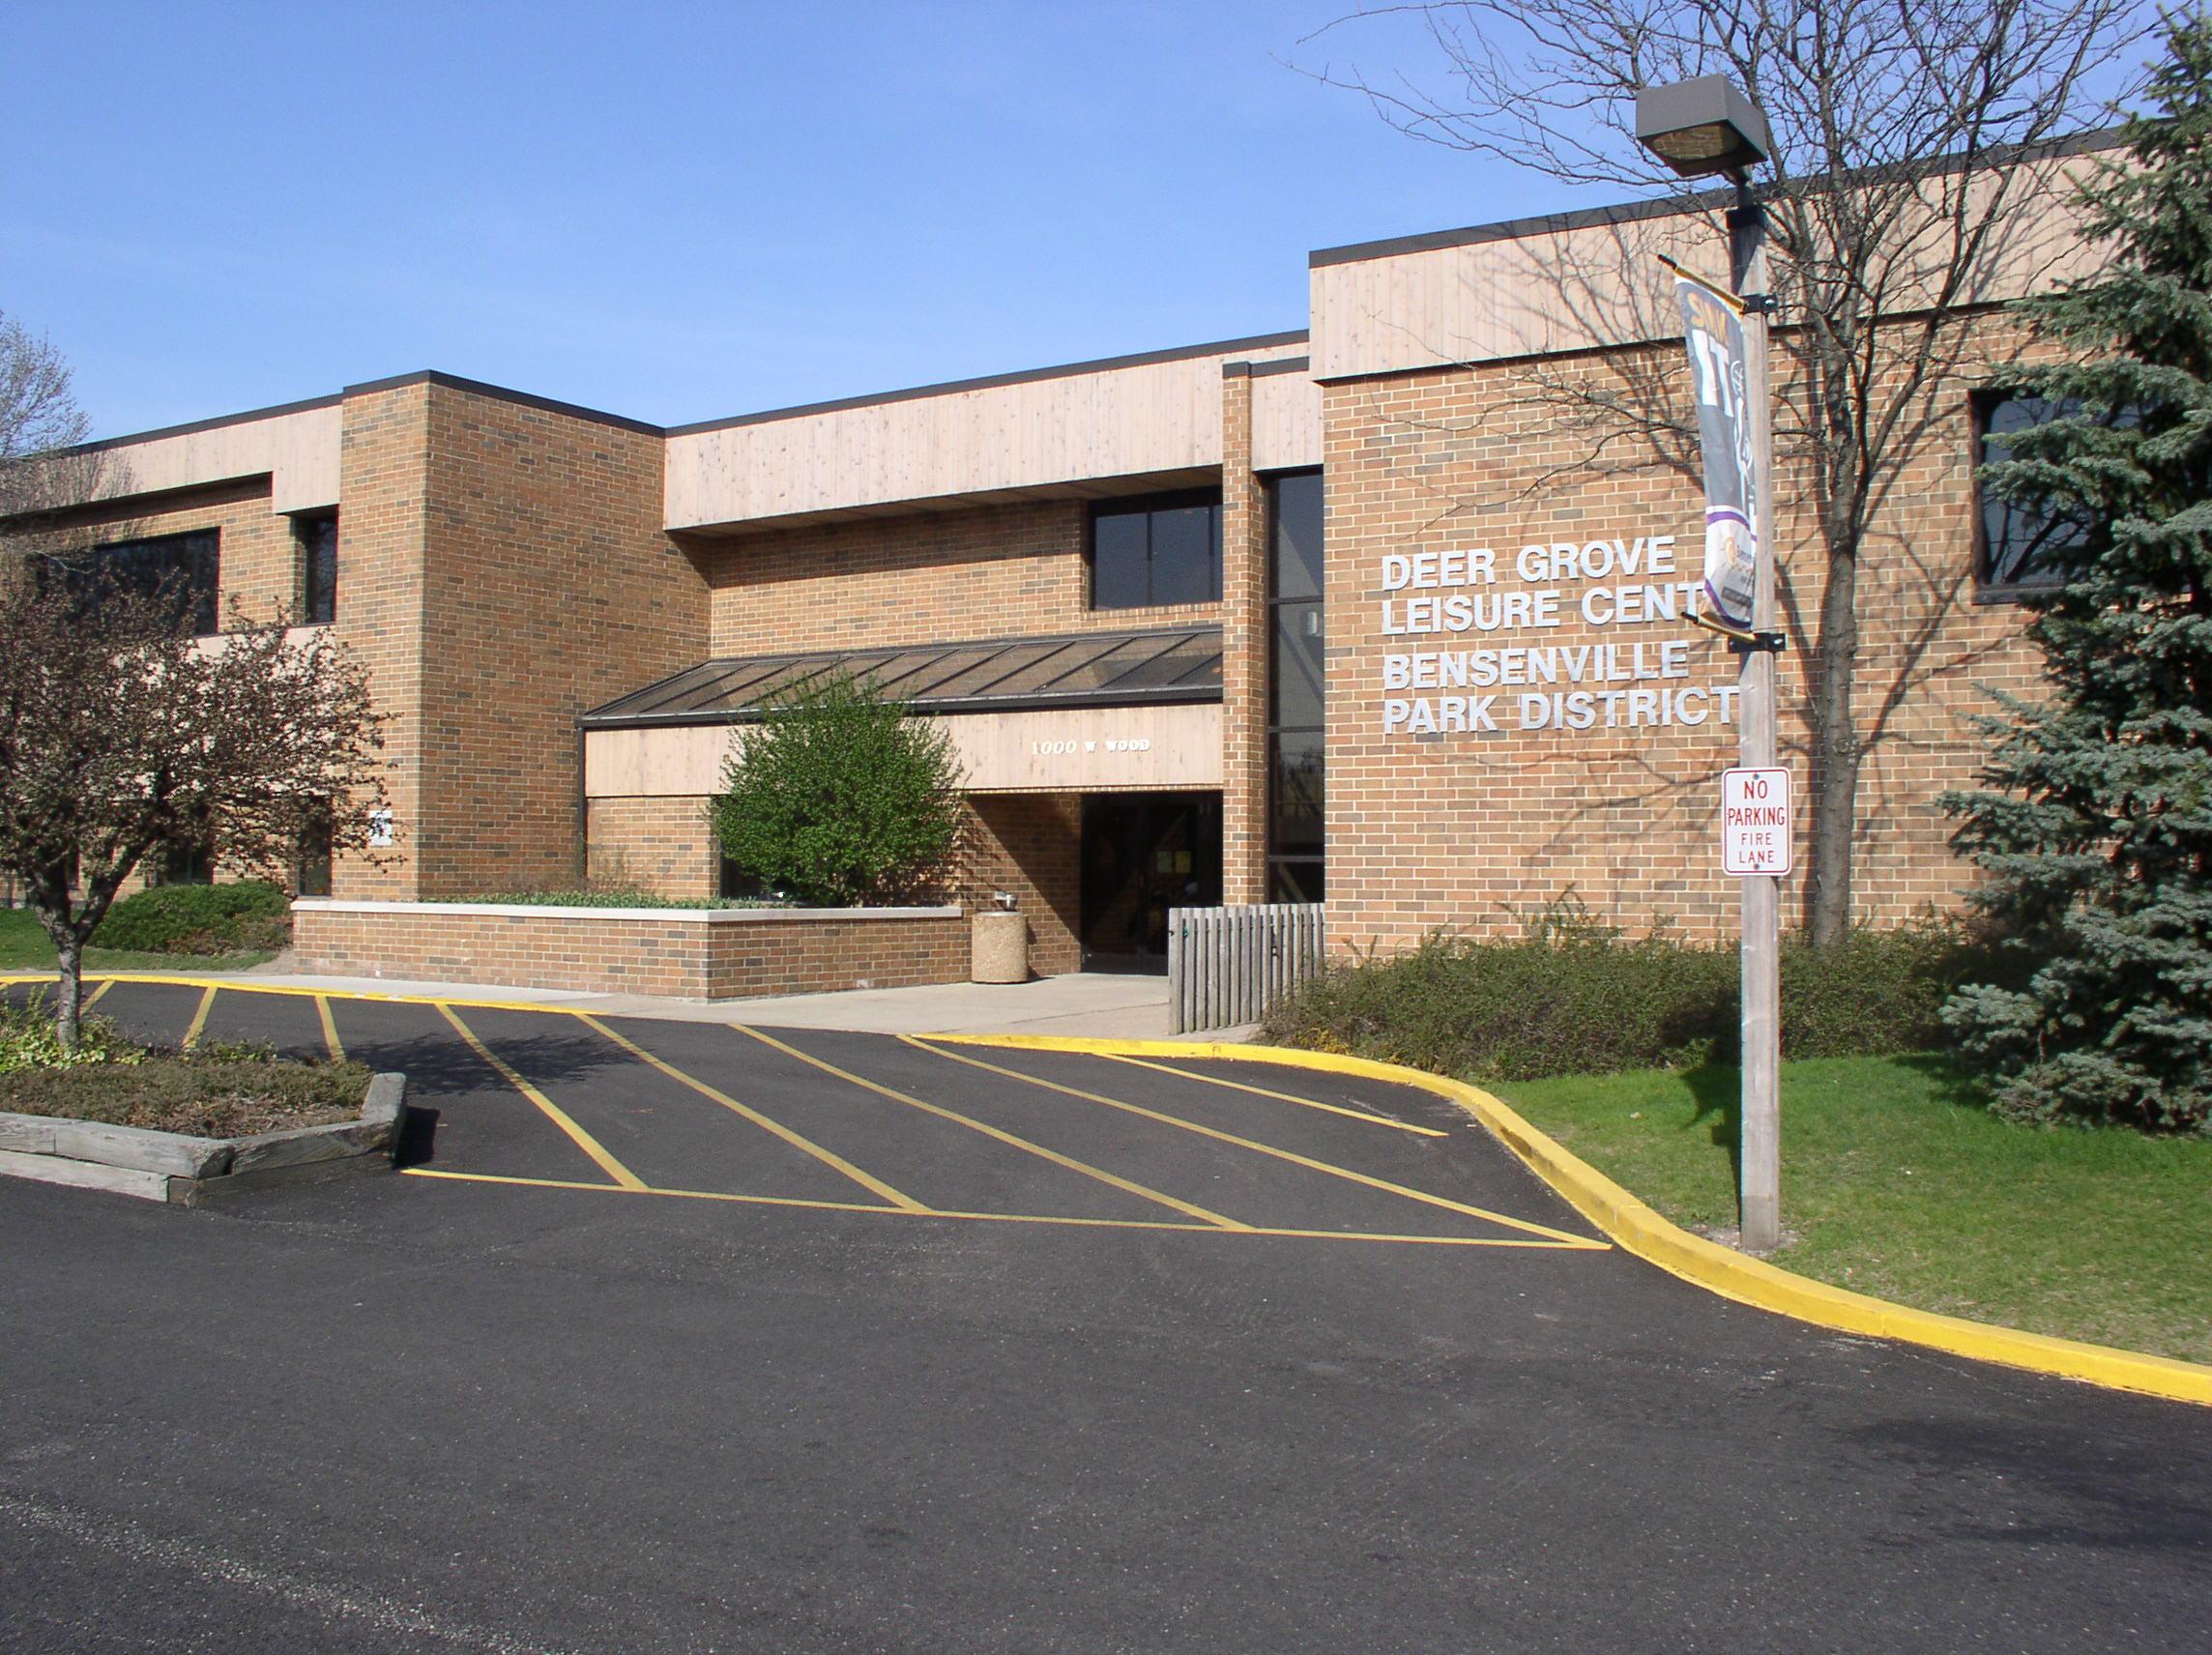 Bensenville Park District image 0